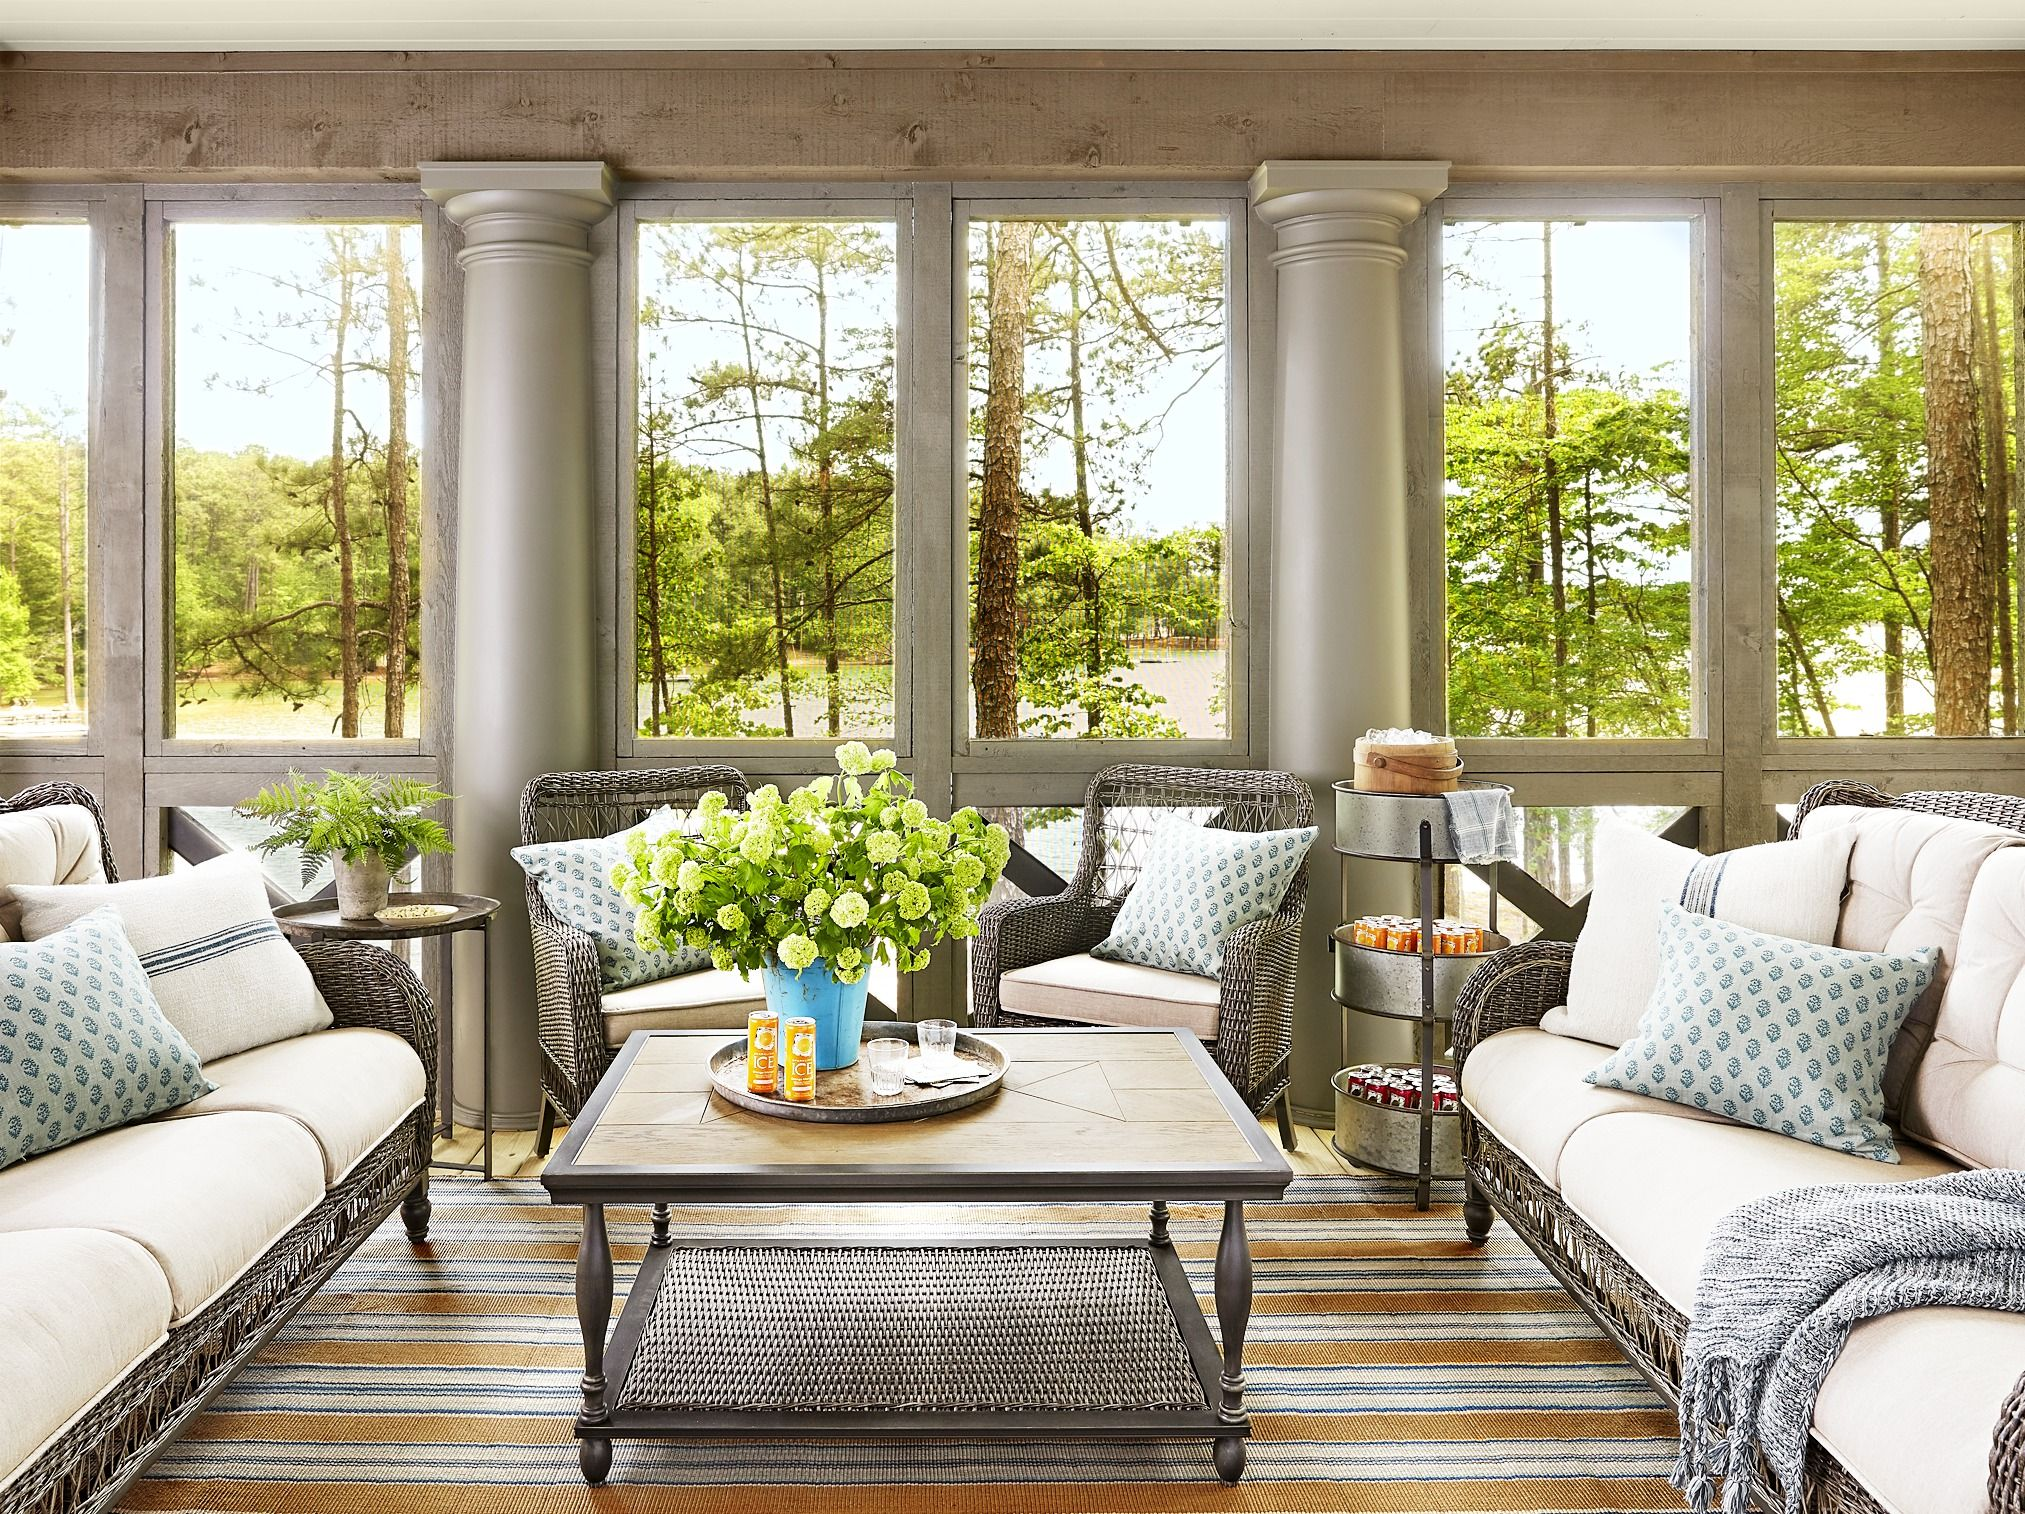 20 Sunroom Decorating Ideas Best Designs For Sun Rooms